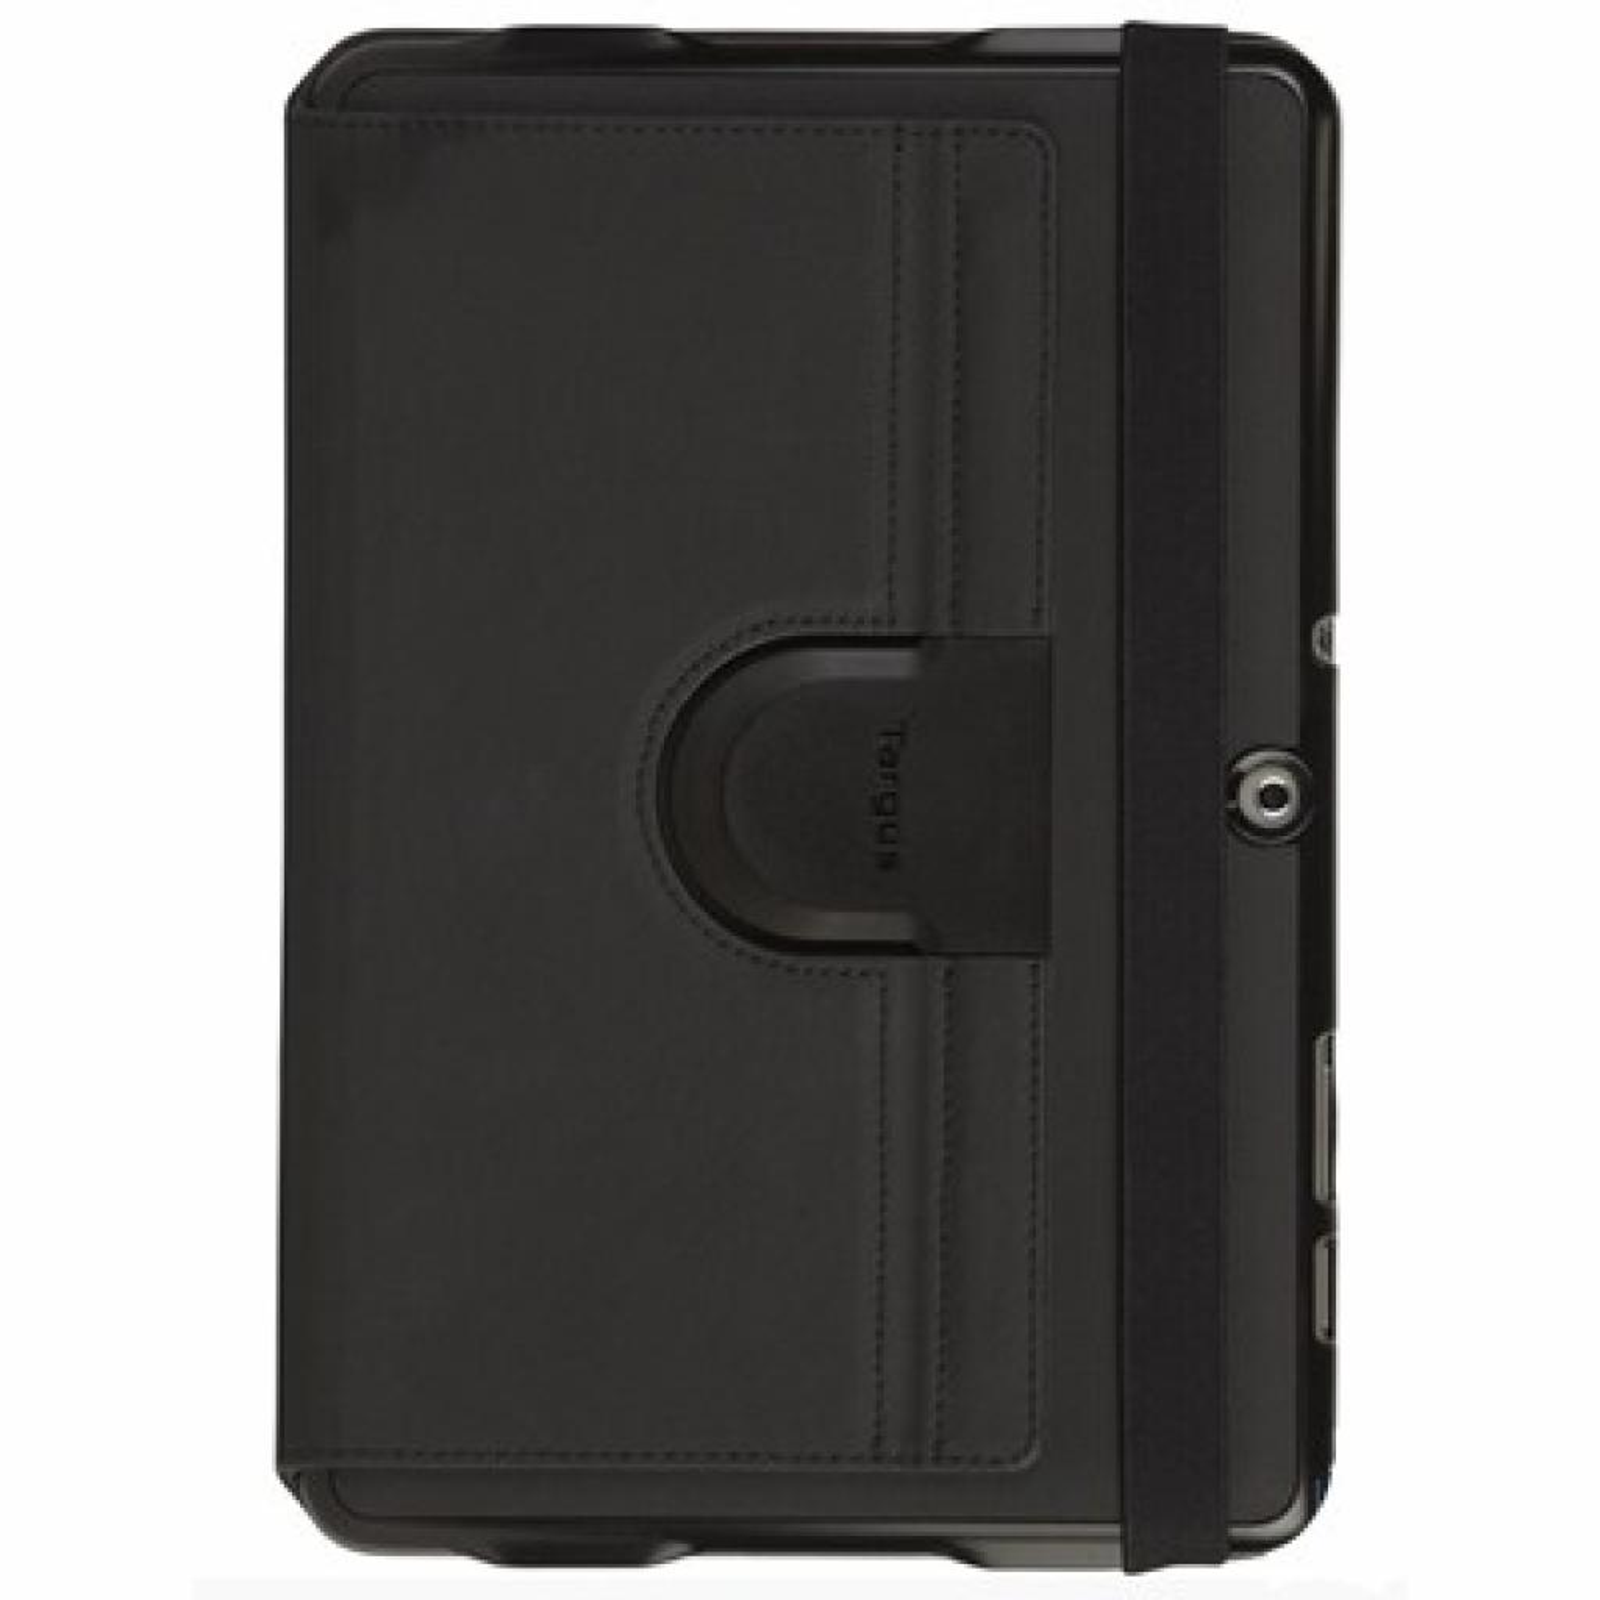 Чехол для планшета Targus 10 Galaxy Tab3 (THZ205EU)